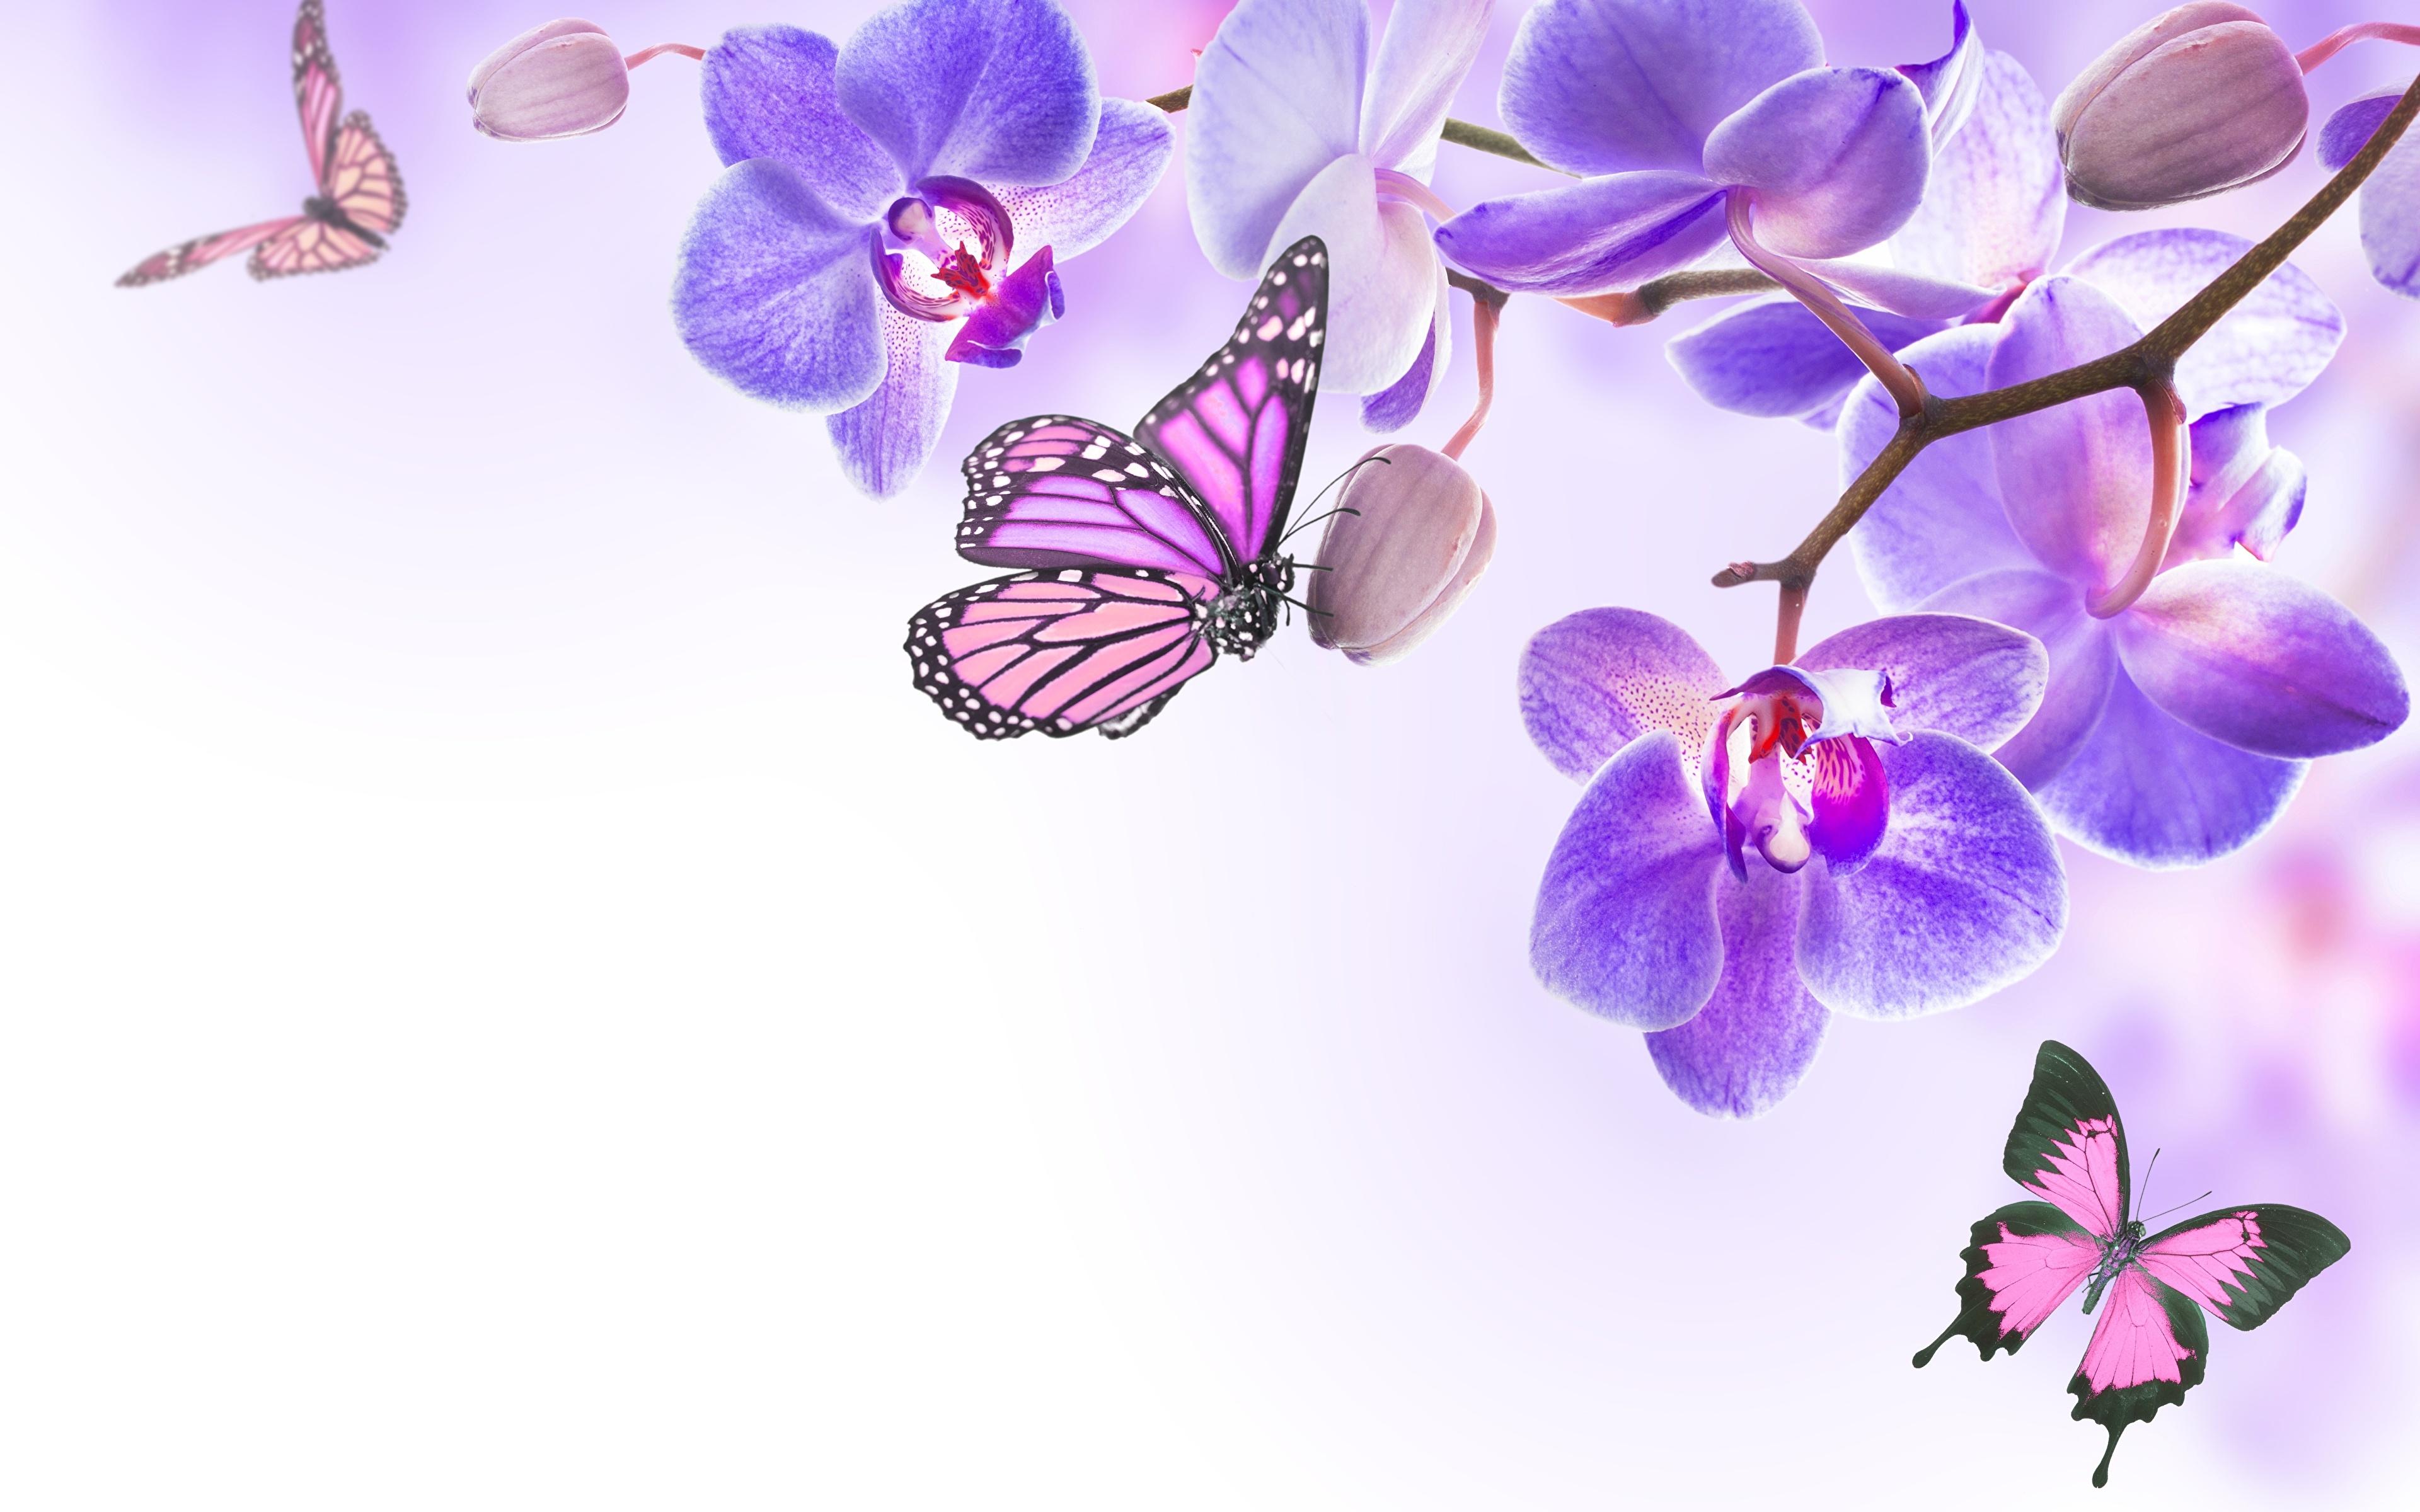 графика бабочки цветы вода graphics butterfly flowers water  № 1313536 бесплатно